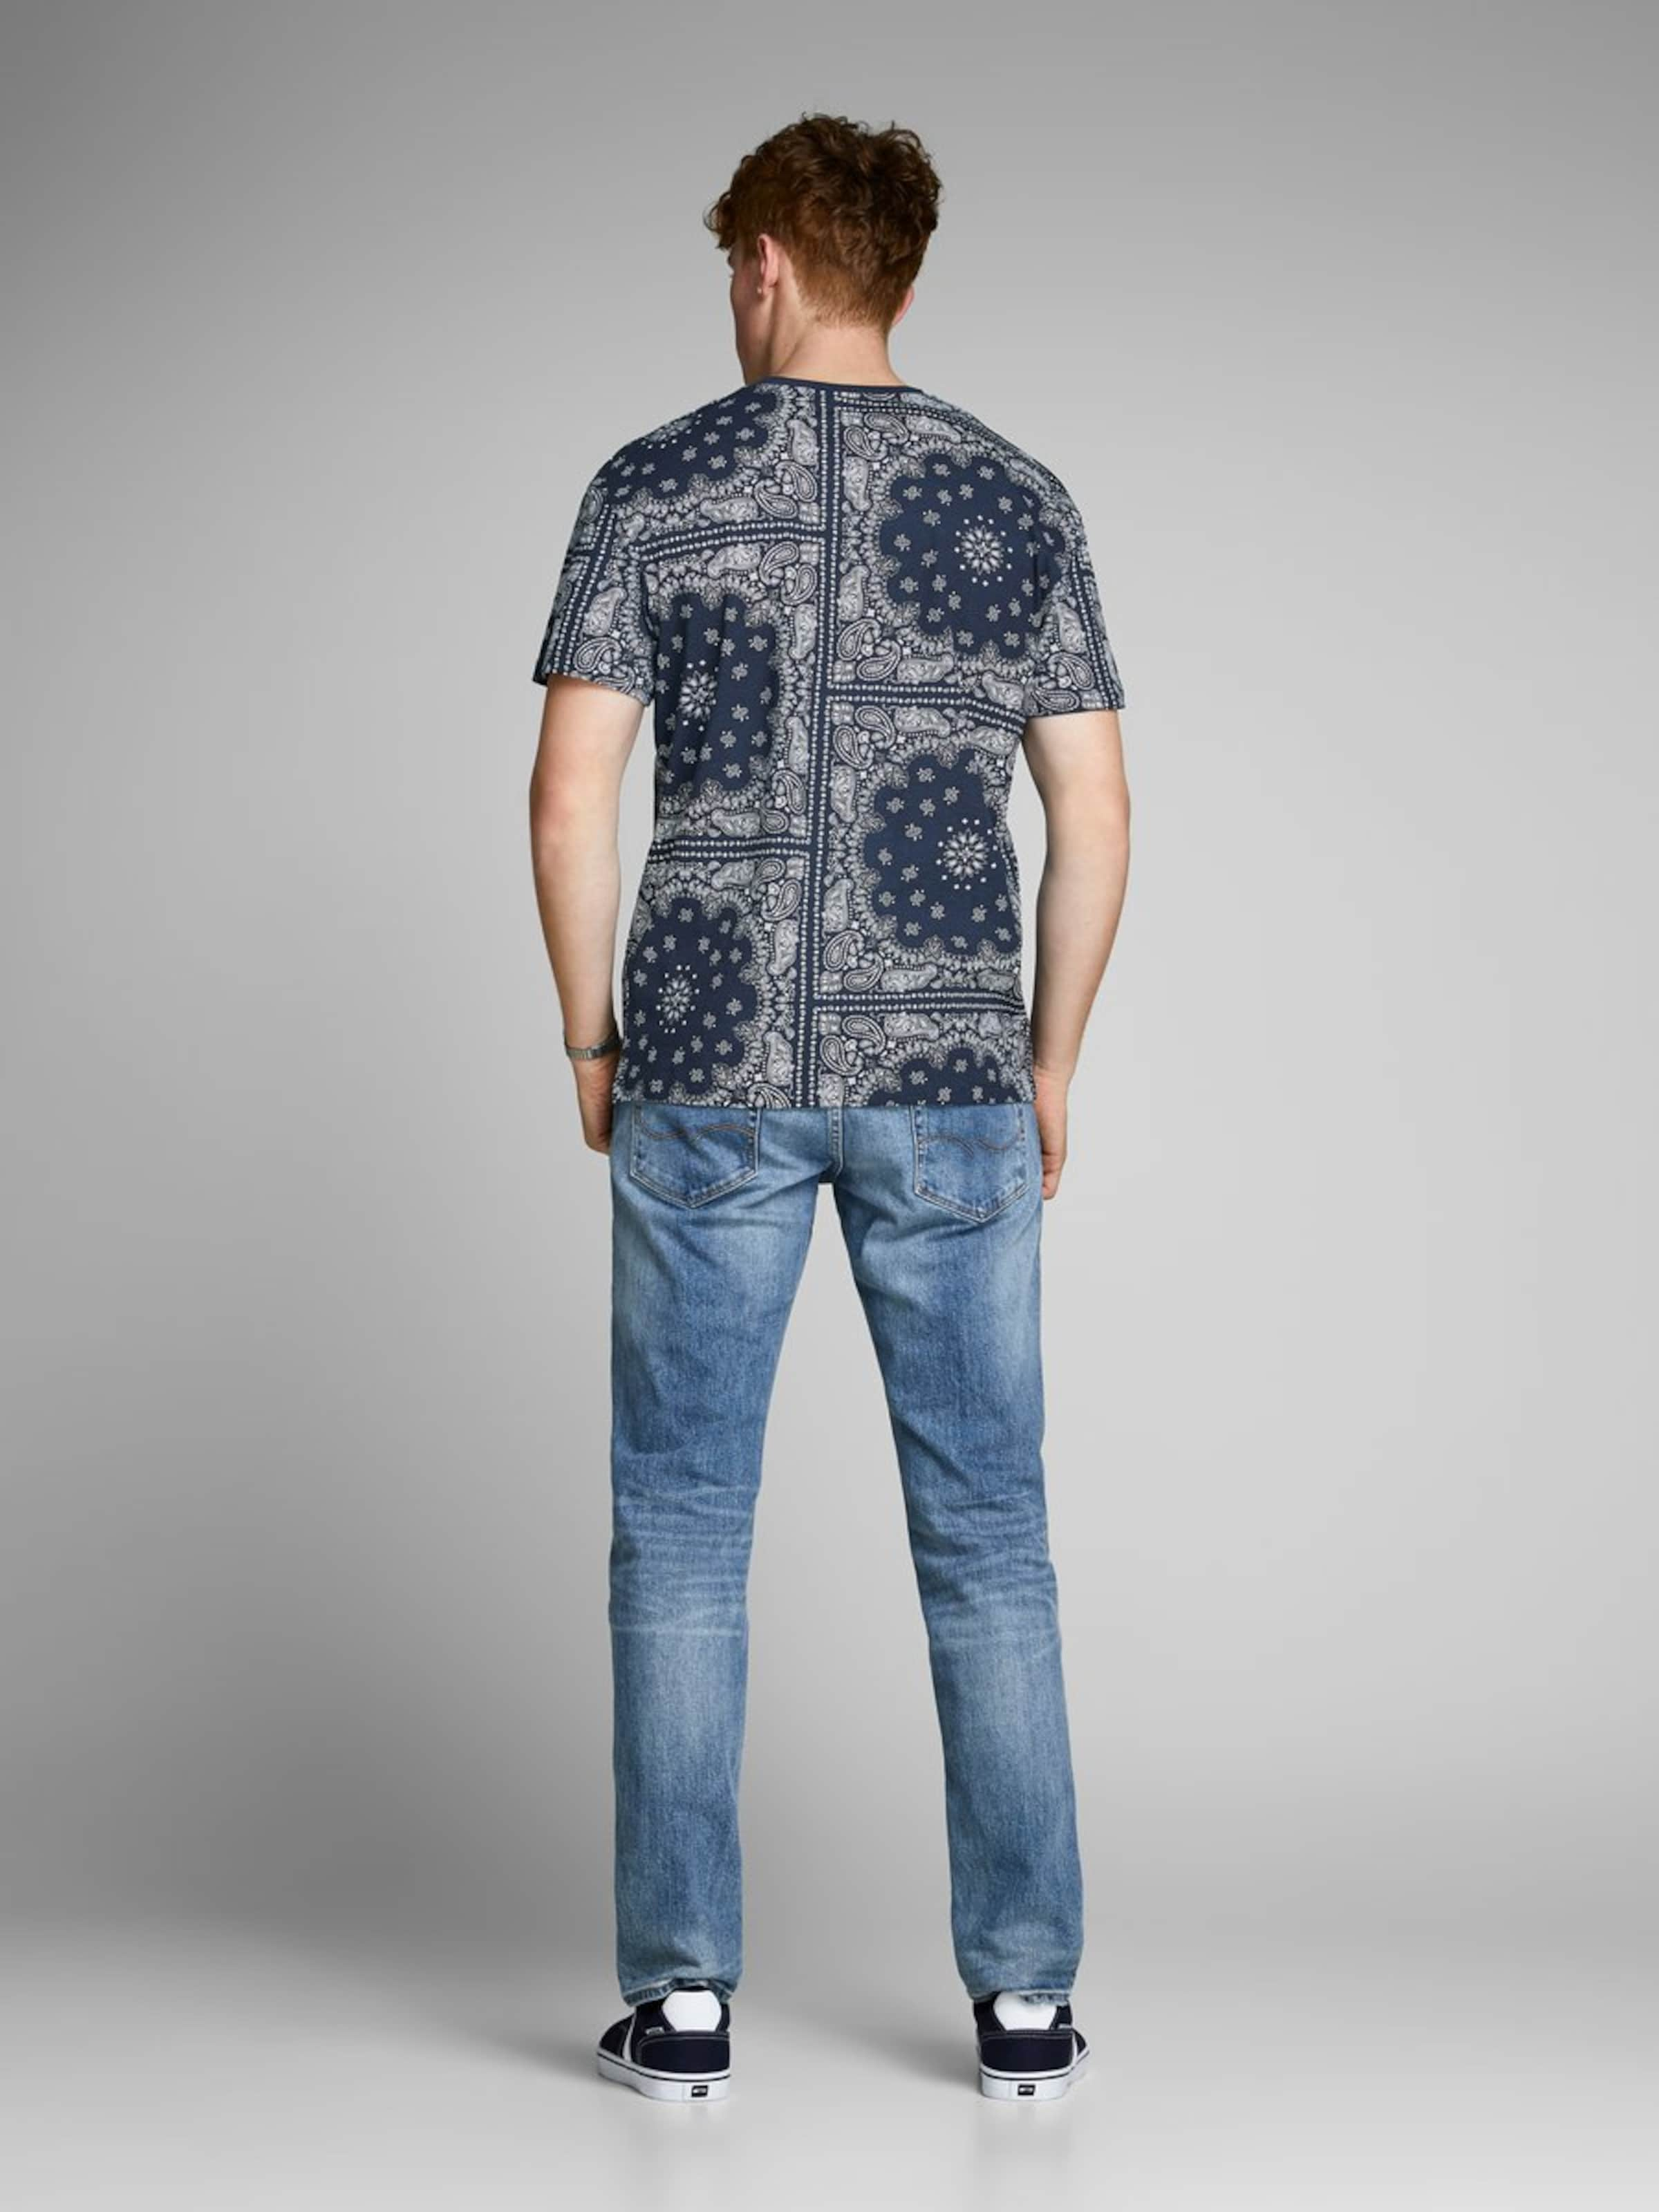 Jones Jackamp; T Bleu shirt En NuitBlanc tdBhCsQrxo